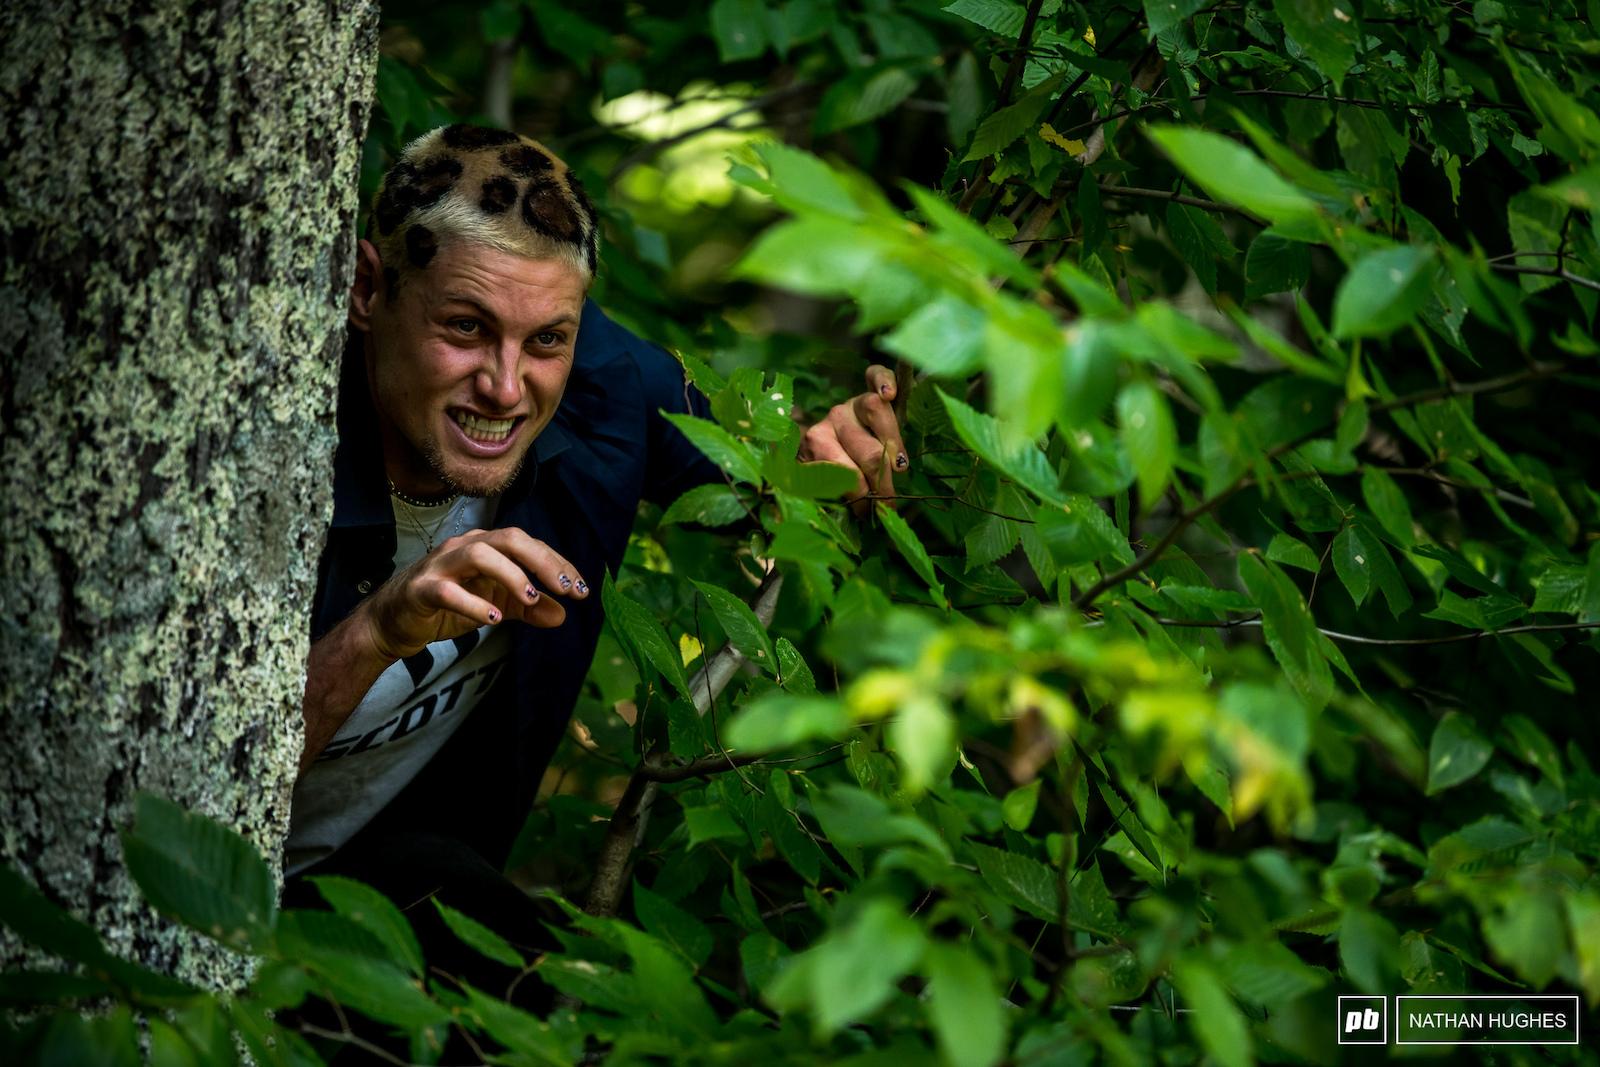 Dangerous creatures lurking in the undergrowth.